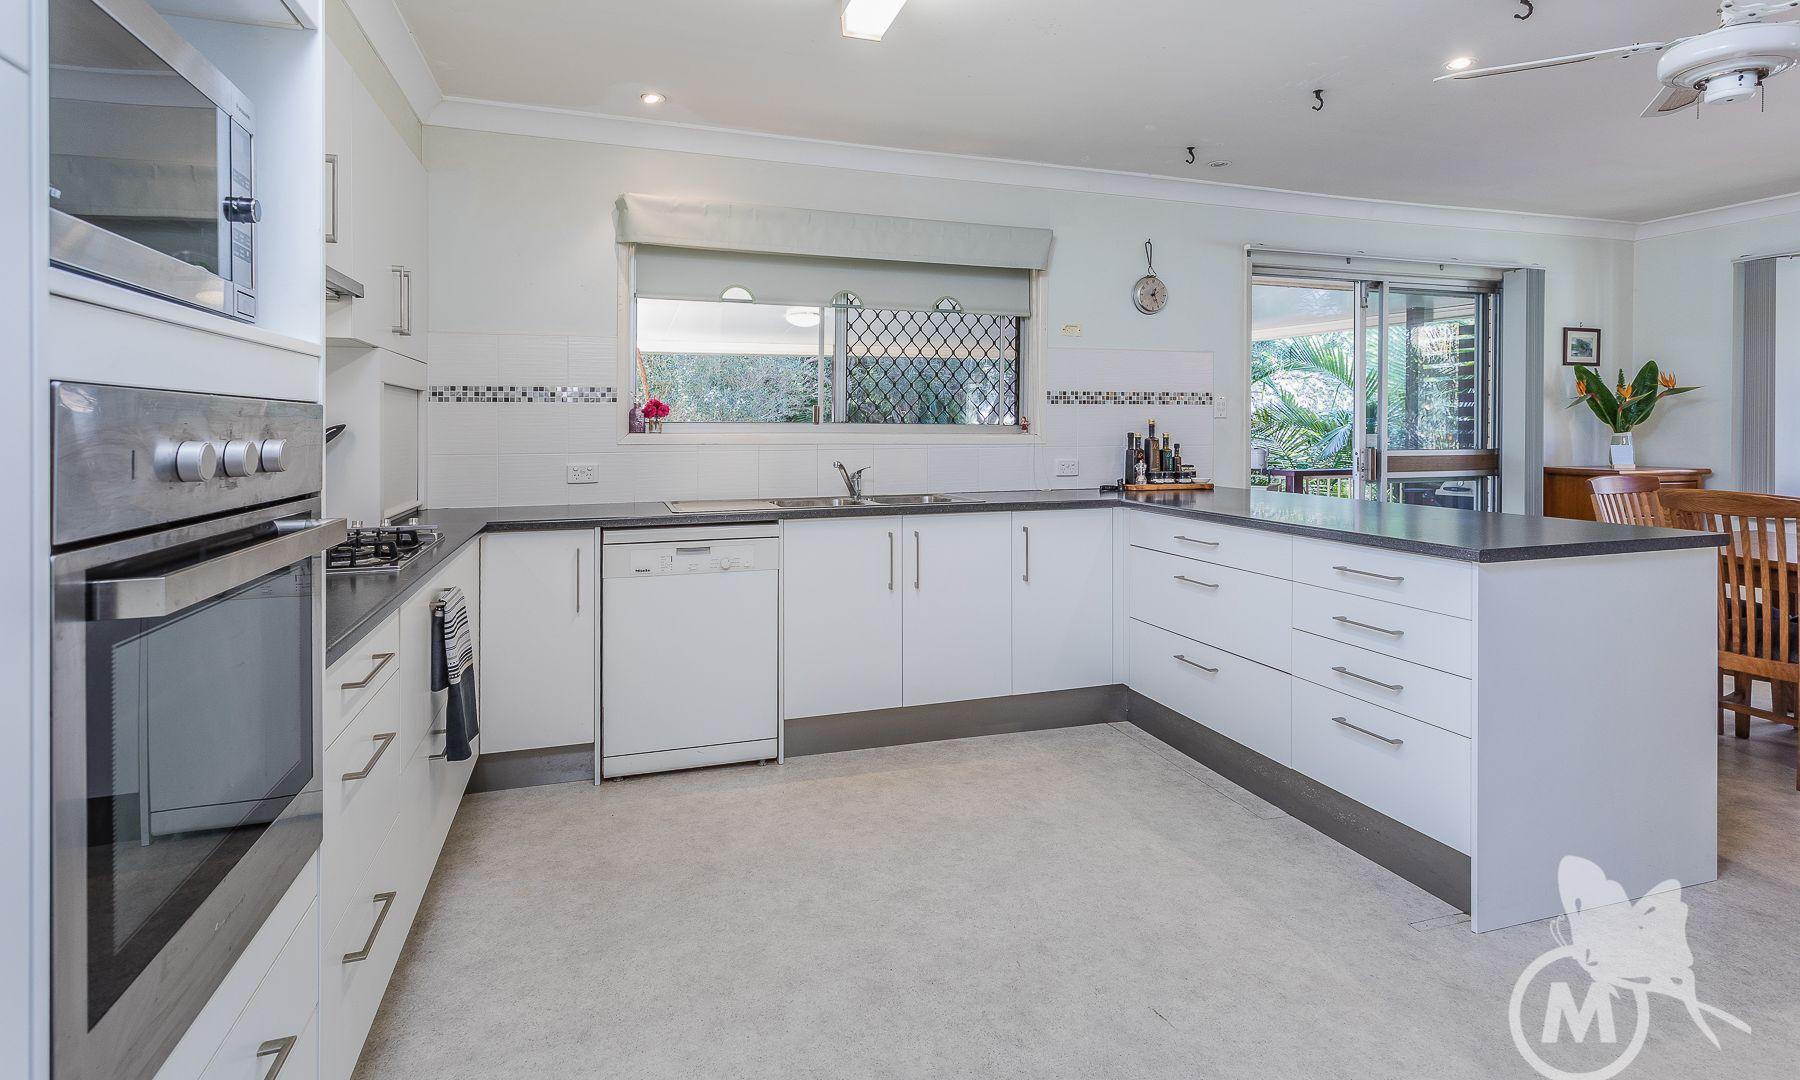 3 Cilento Street, Mcdowall QLD 4053, Image 2